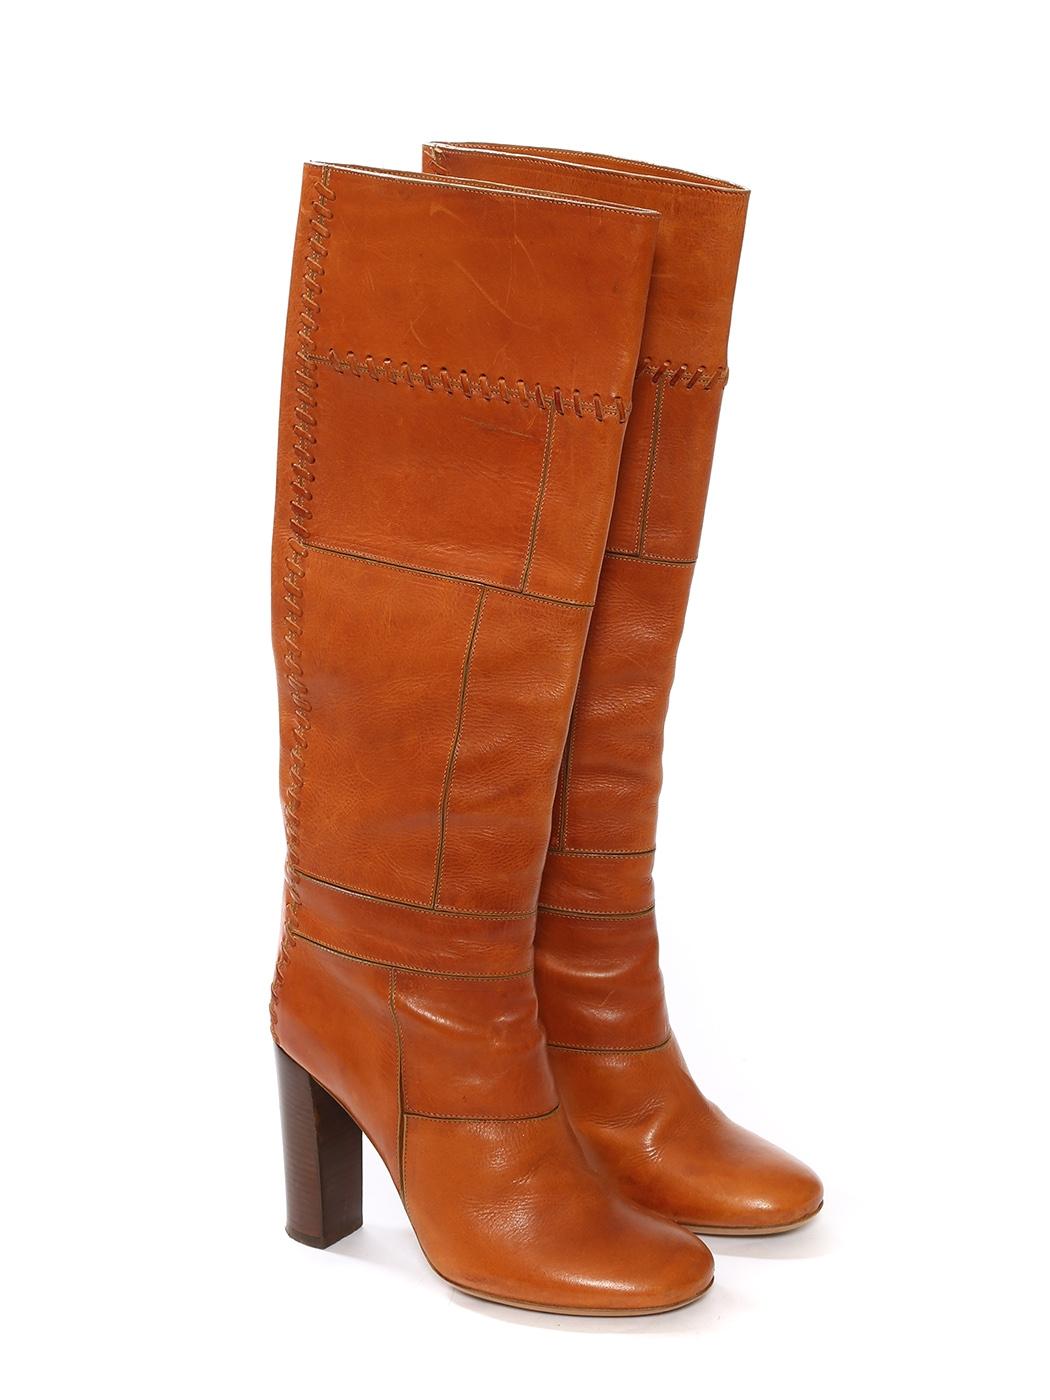 Louise Paris Chloe Camel Patchwork Leather Wooden Heel